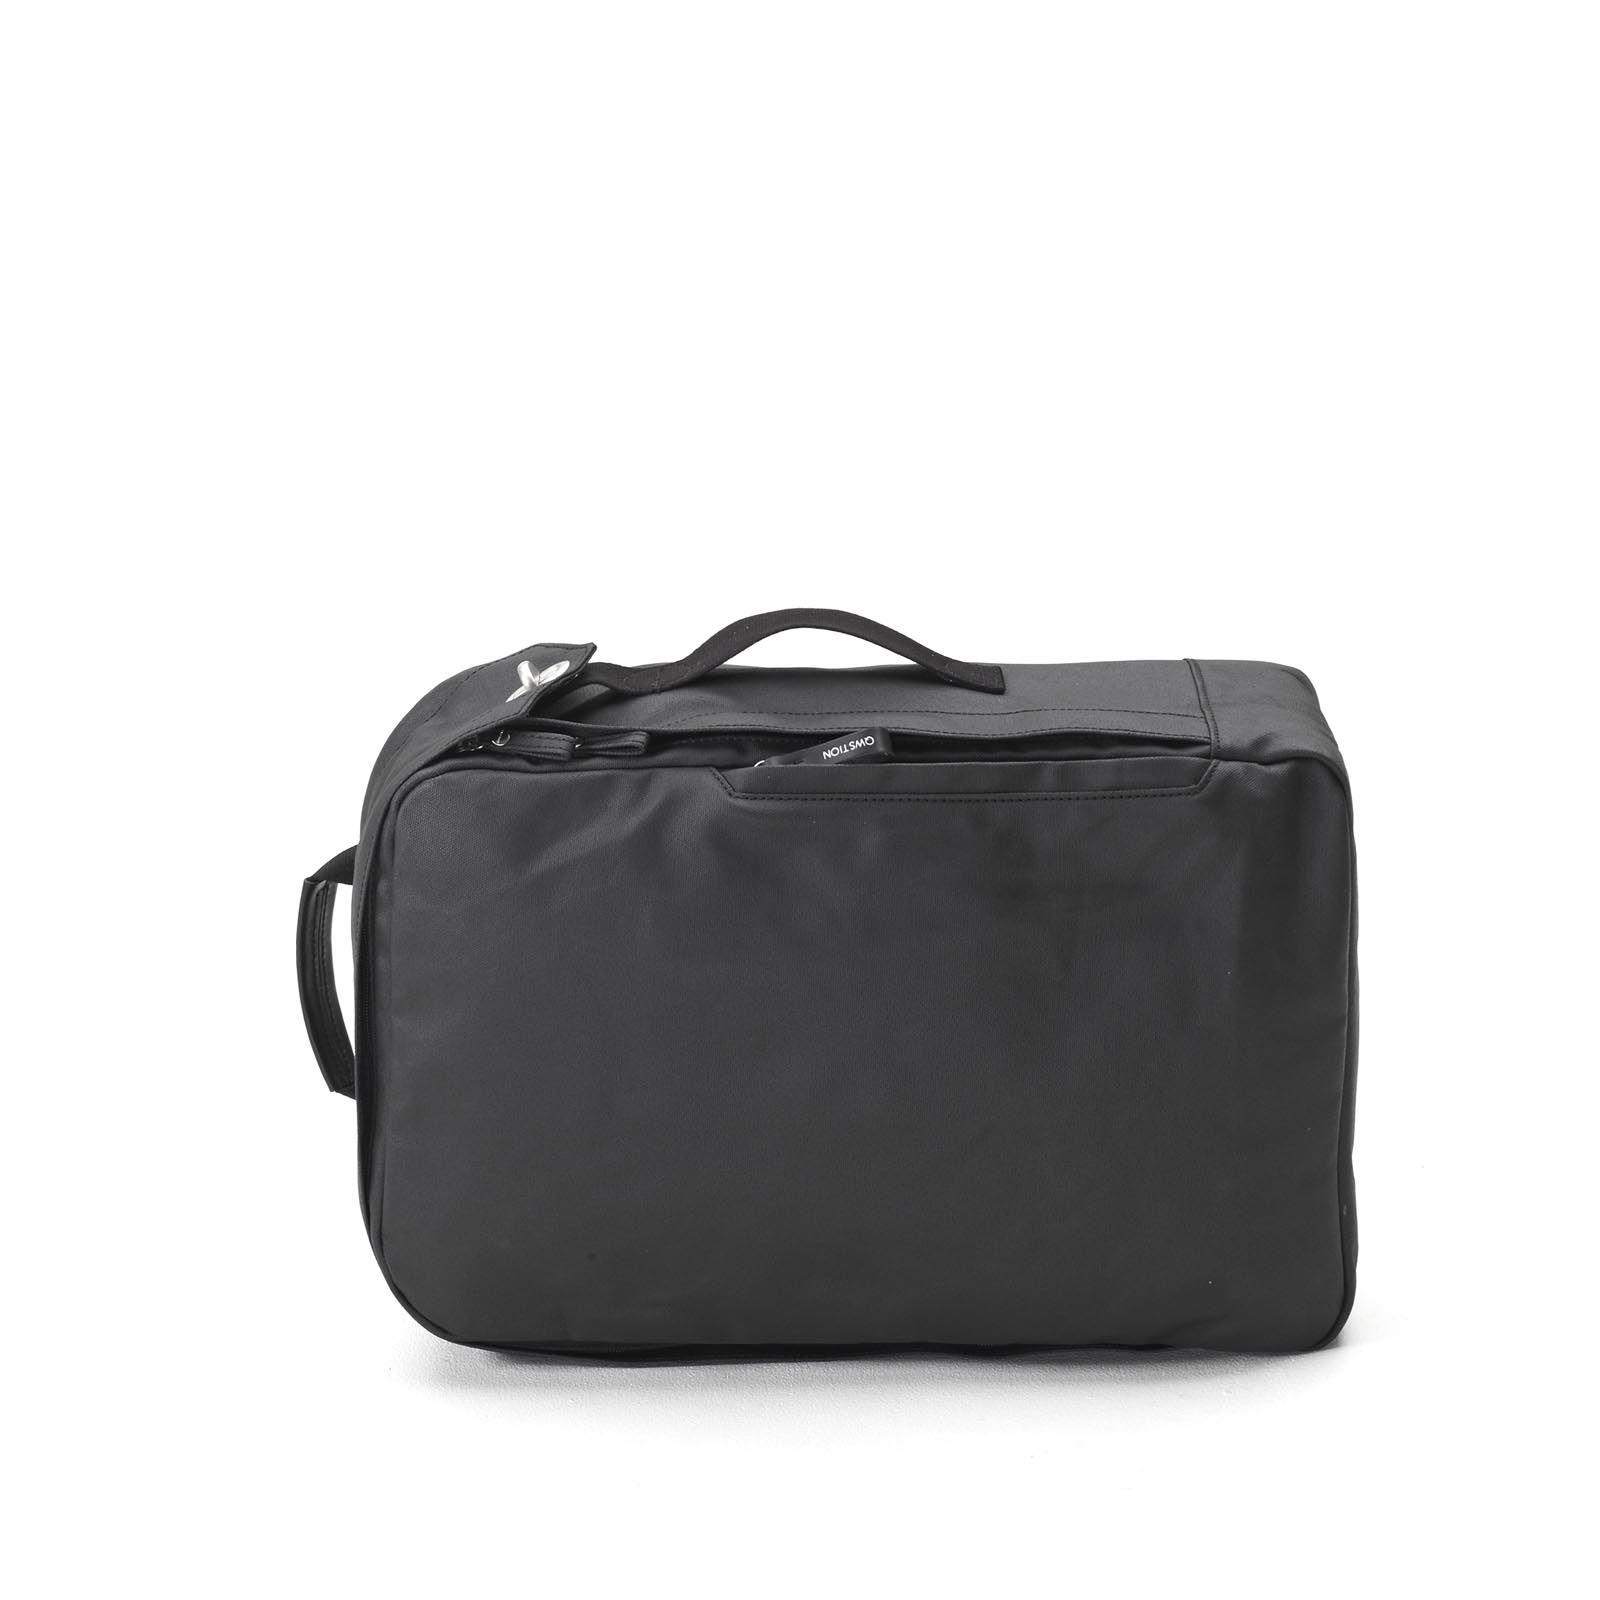 Backpack - Organic Jet Black